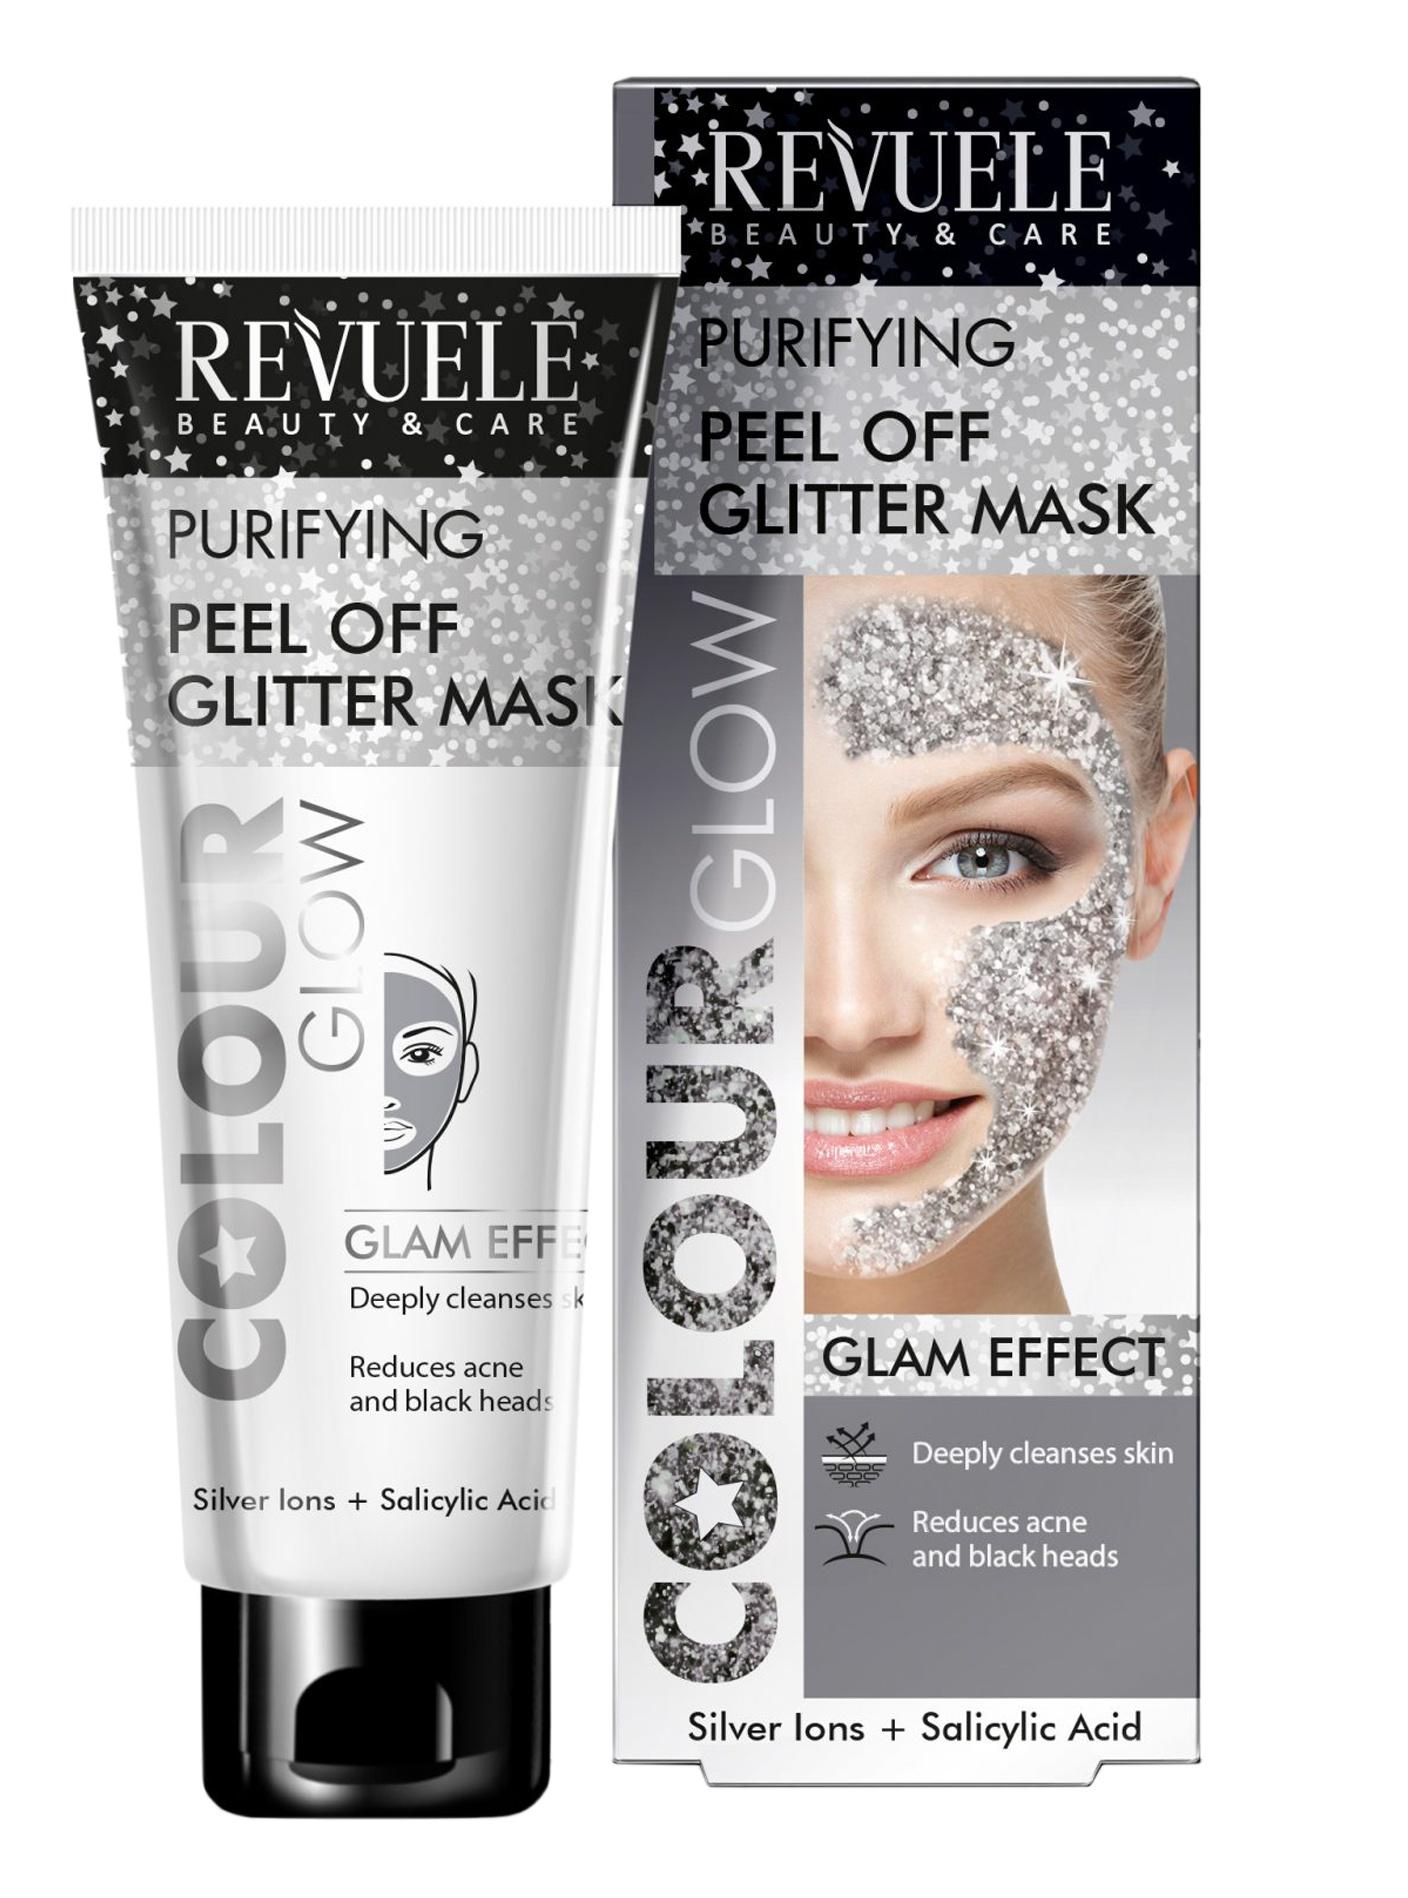 Revuele Purifying Peel Off Glitter Mask